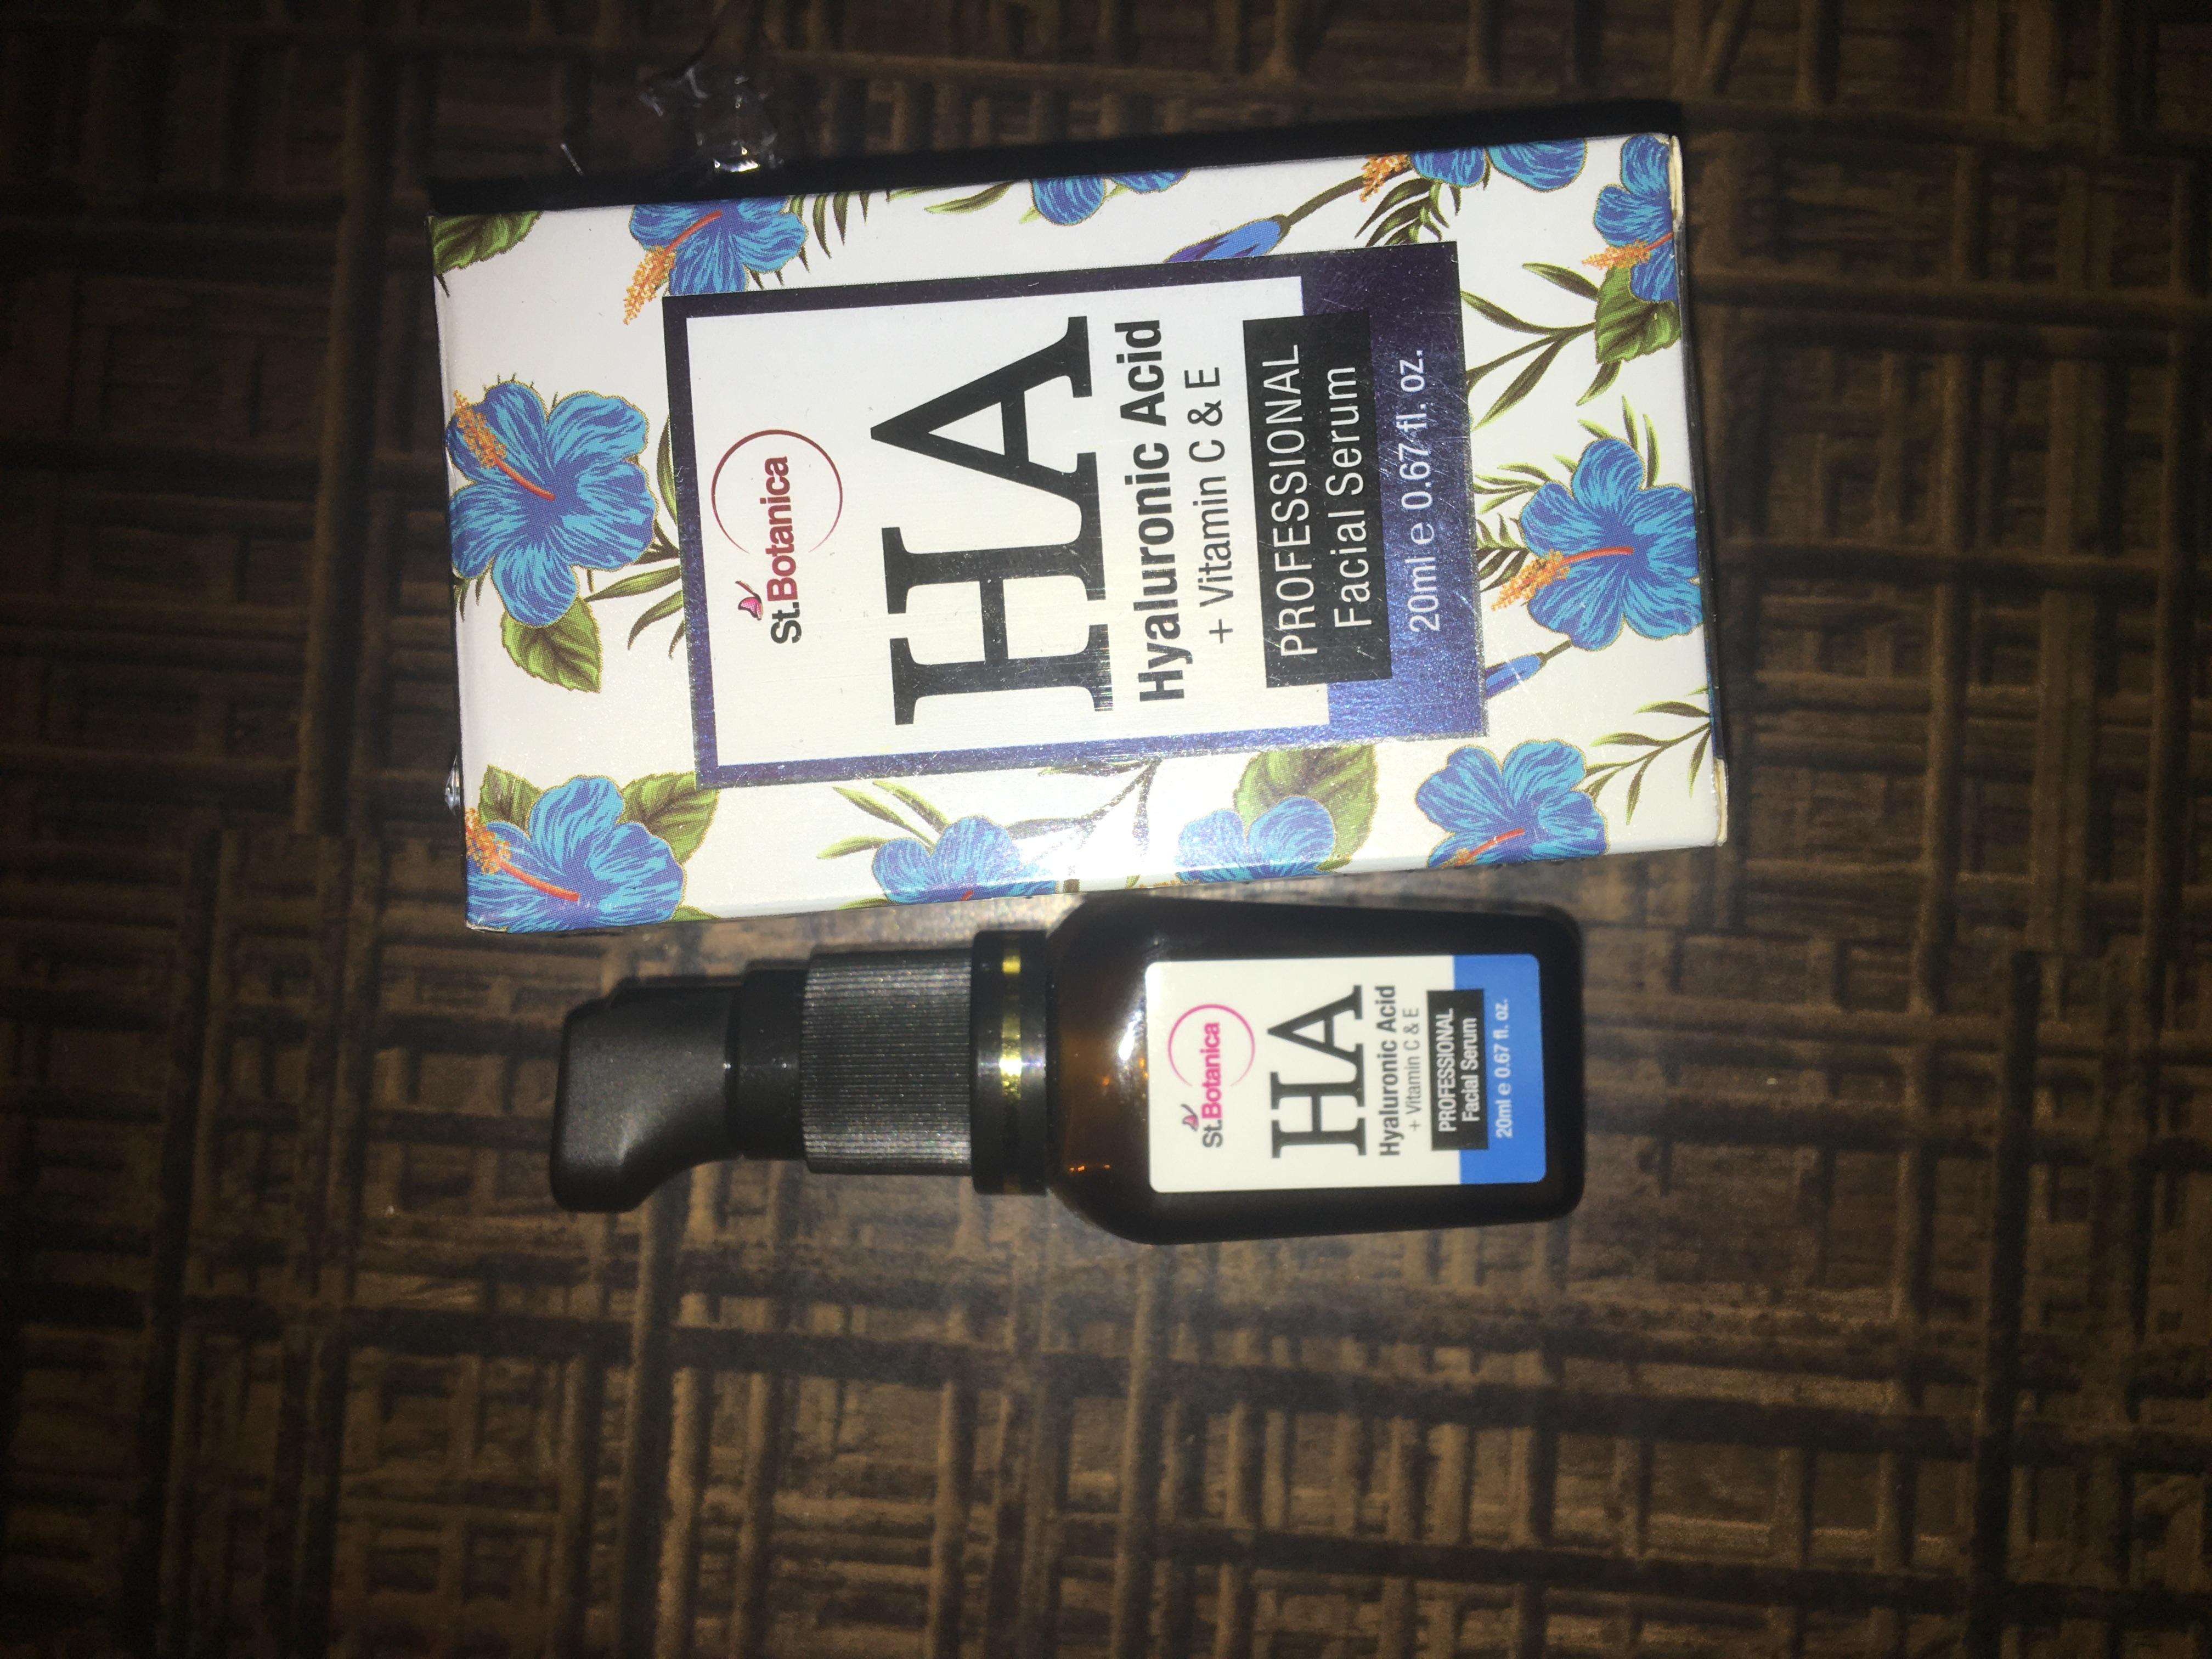 St.Botanica Hyaluronic Acid Facial Serum + Vitamin C, E-Best serum for under eye dark circles, anti aging, skin brightening-By harshita_kanjani-8